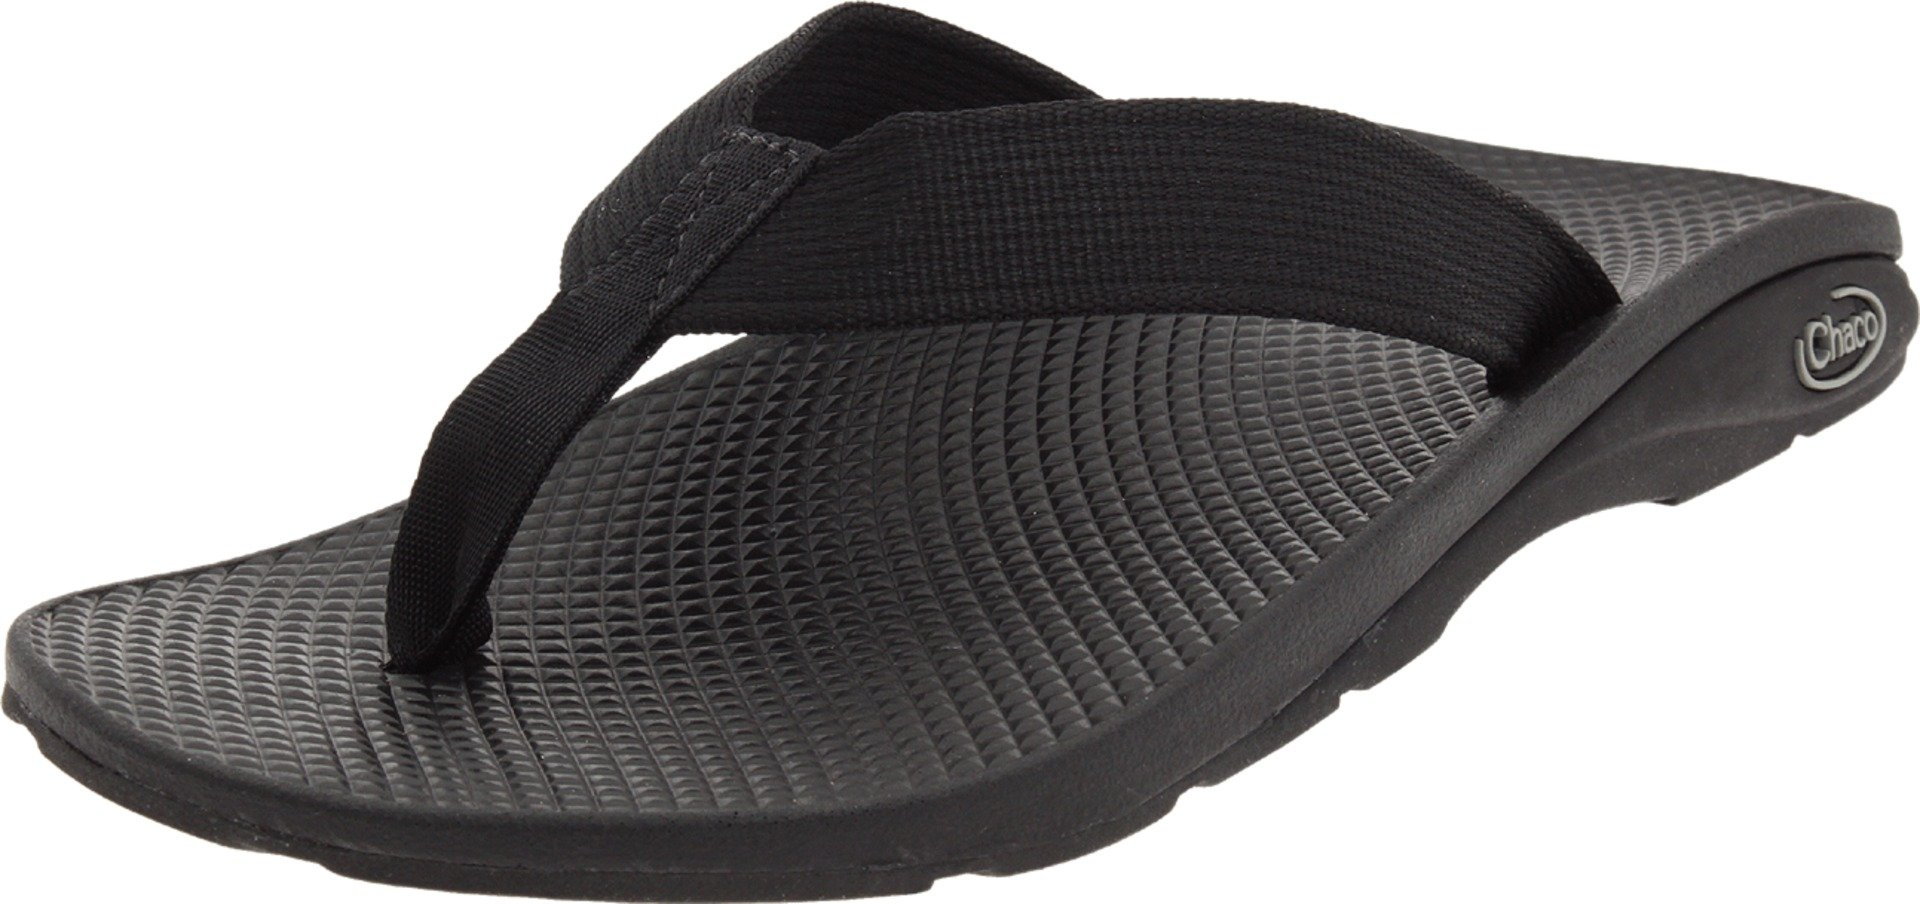 Chaco Men's Flip EcoTread Sandal,Black,11 M US